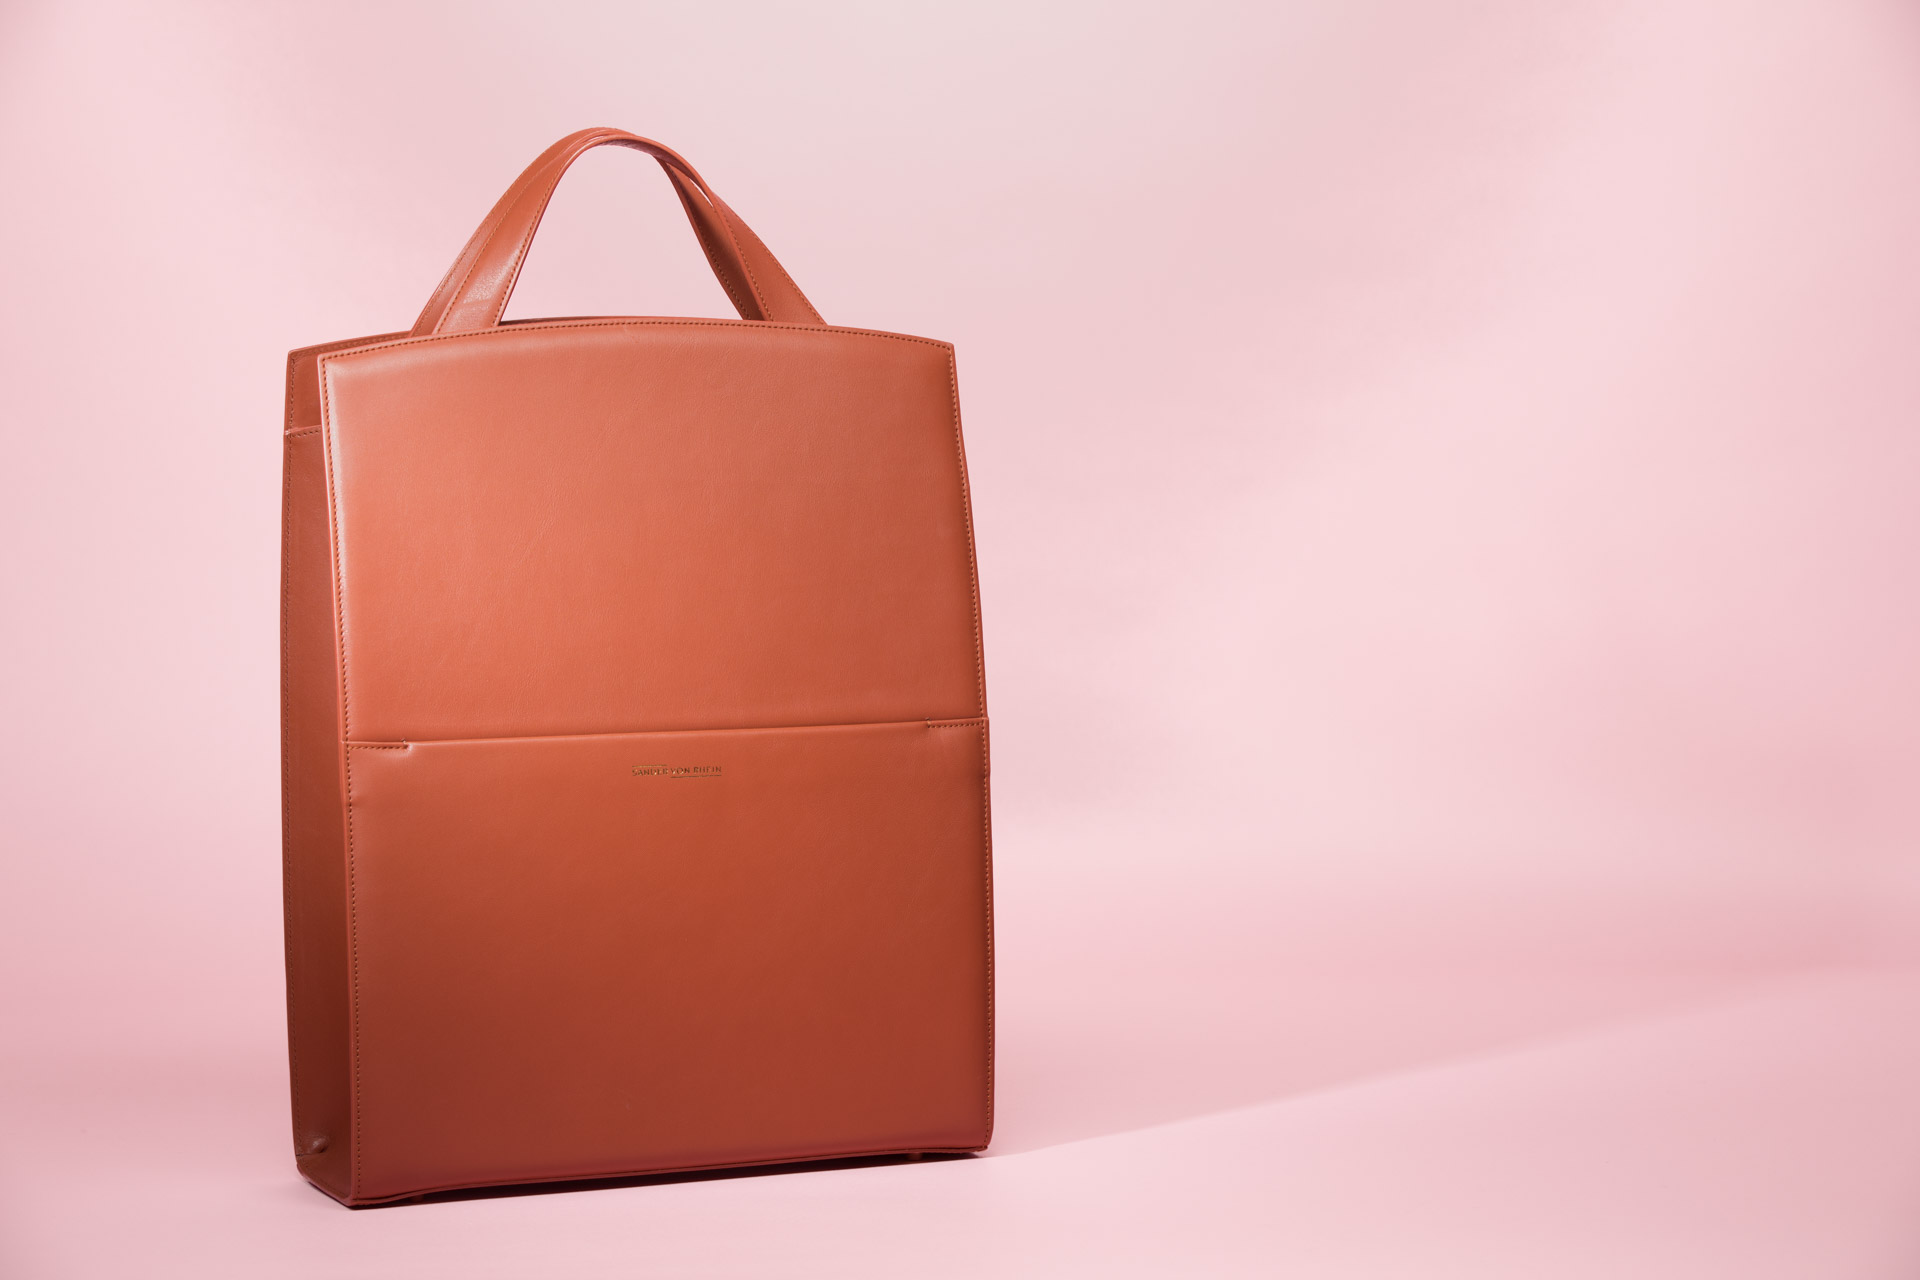 WEB Backup bags shop presentation-18.jpg